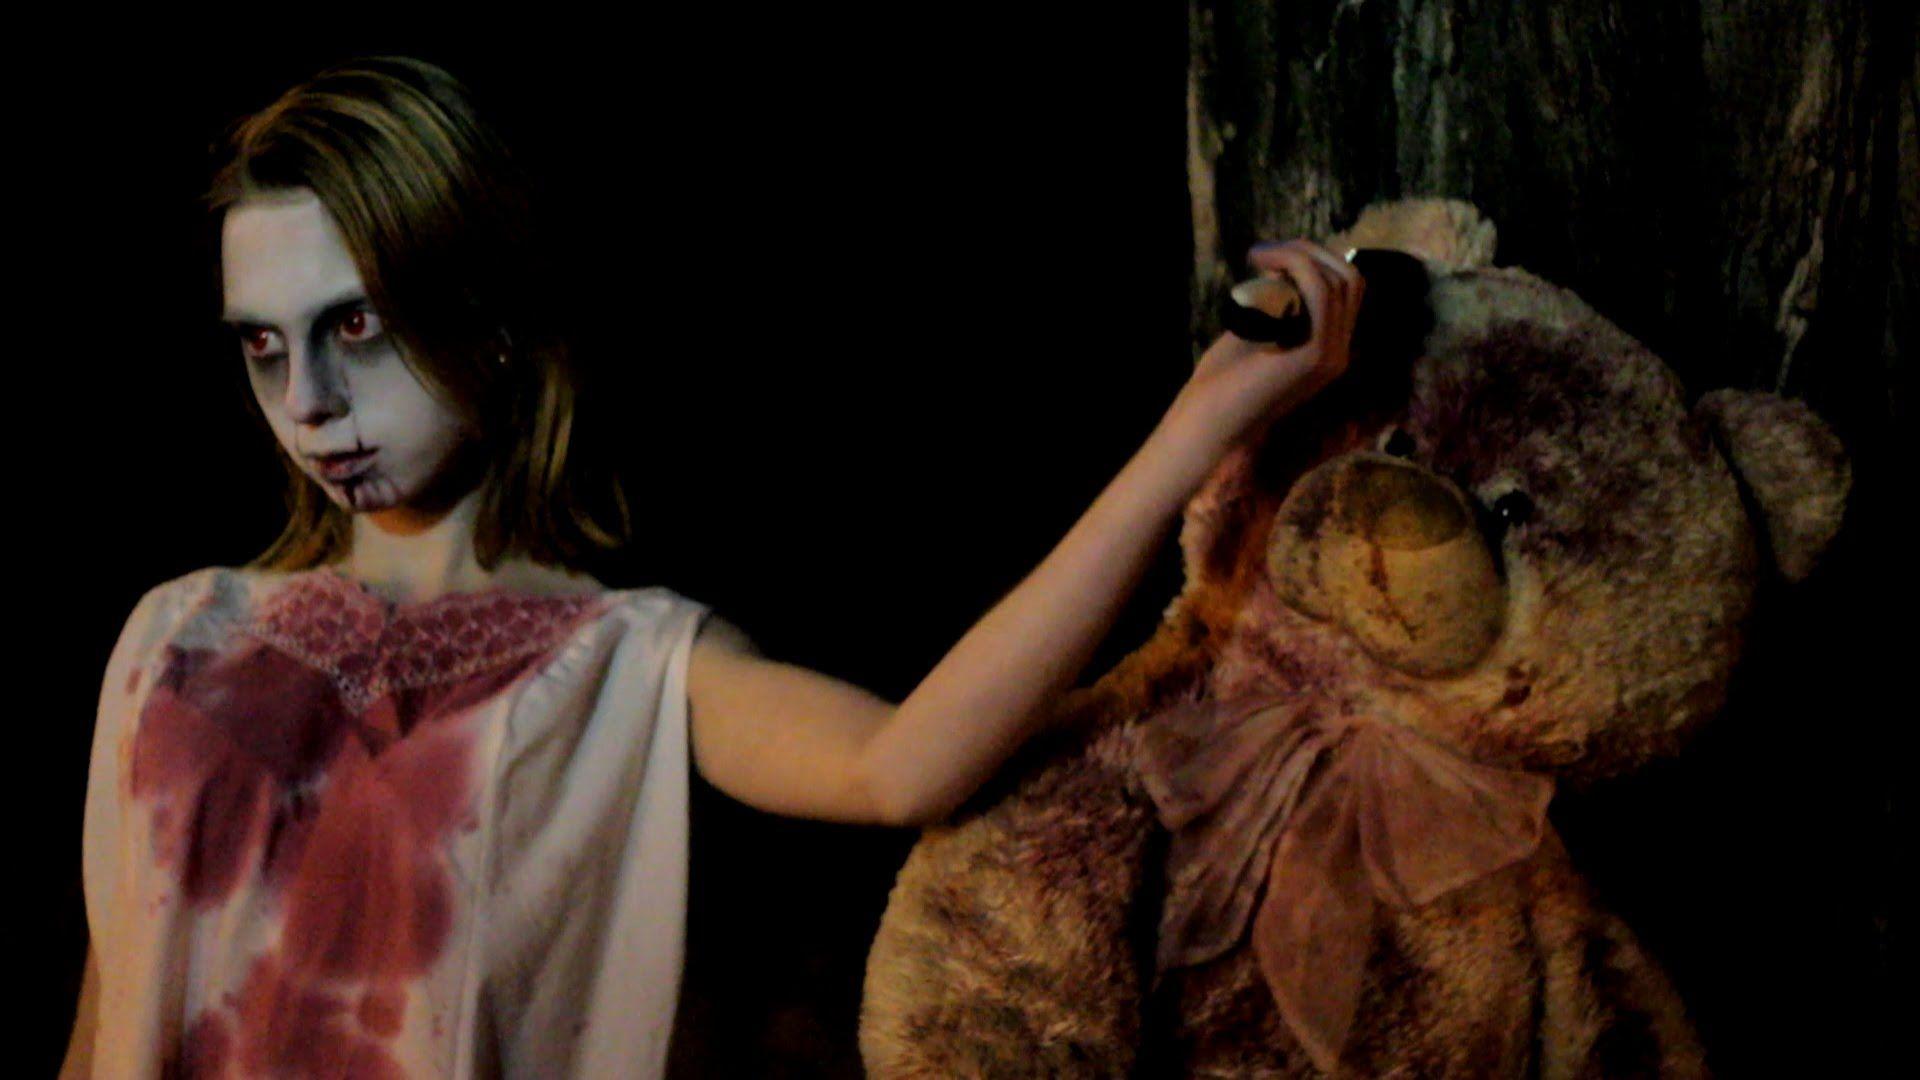 Scary Girl Prank.THE MOST SCARY PRANK!!!! | Halloween | Pinterest ...